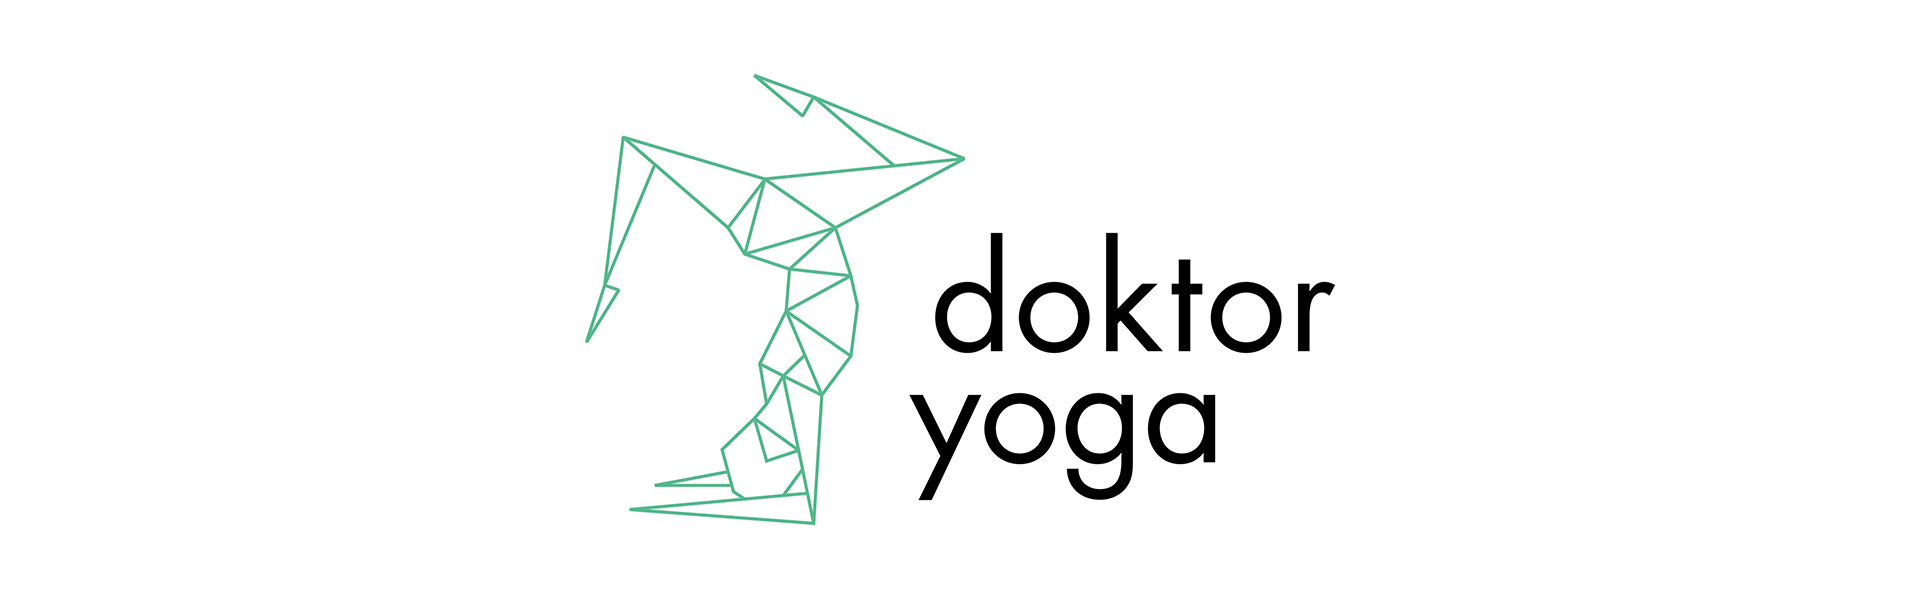 Dr Yoga Teacher Training